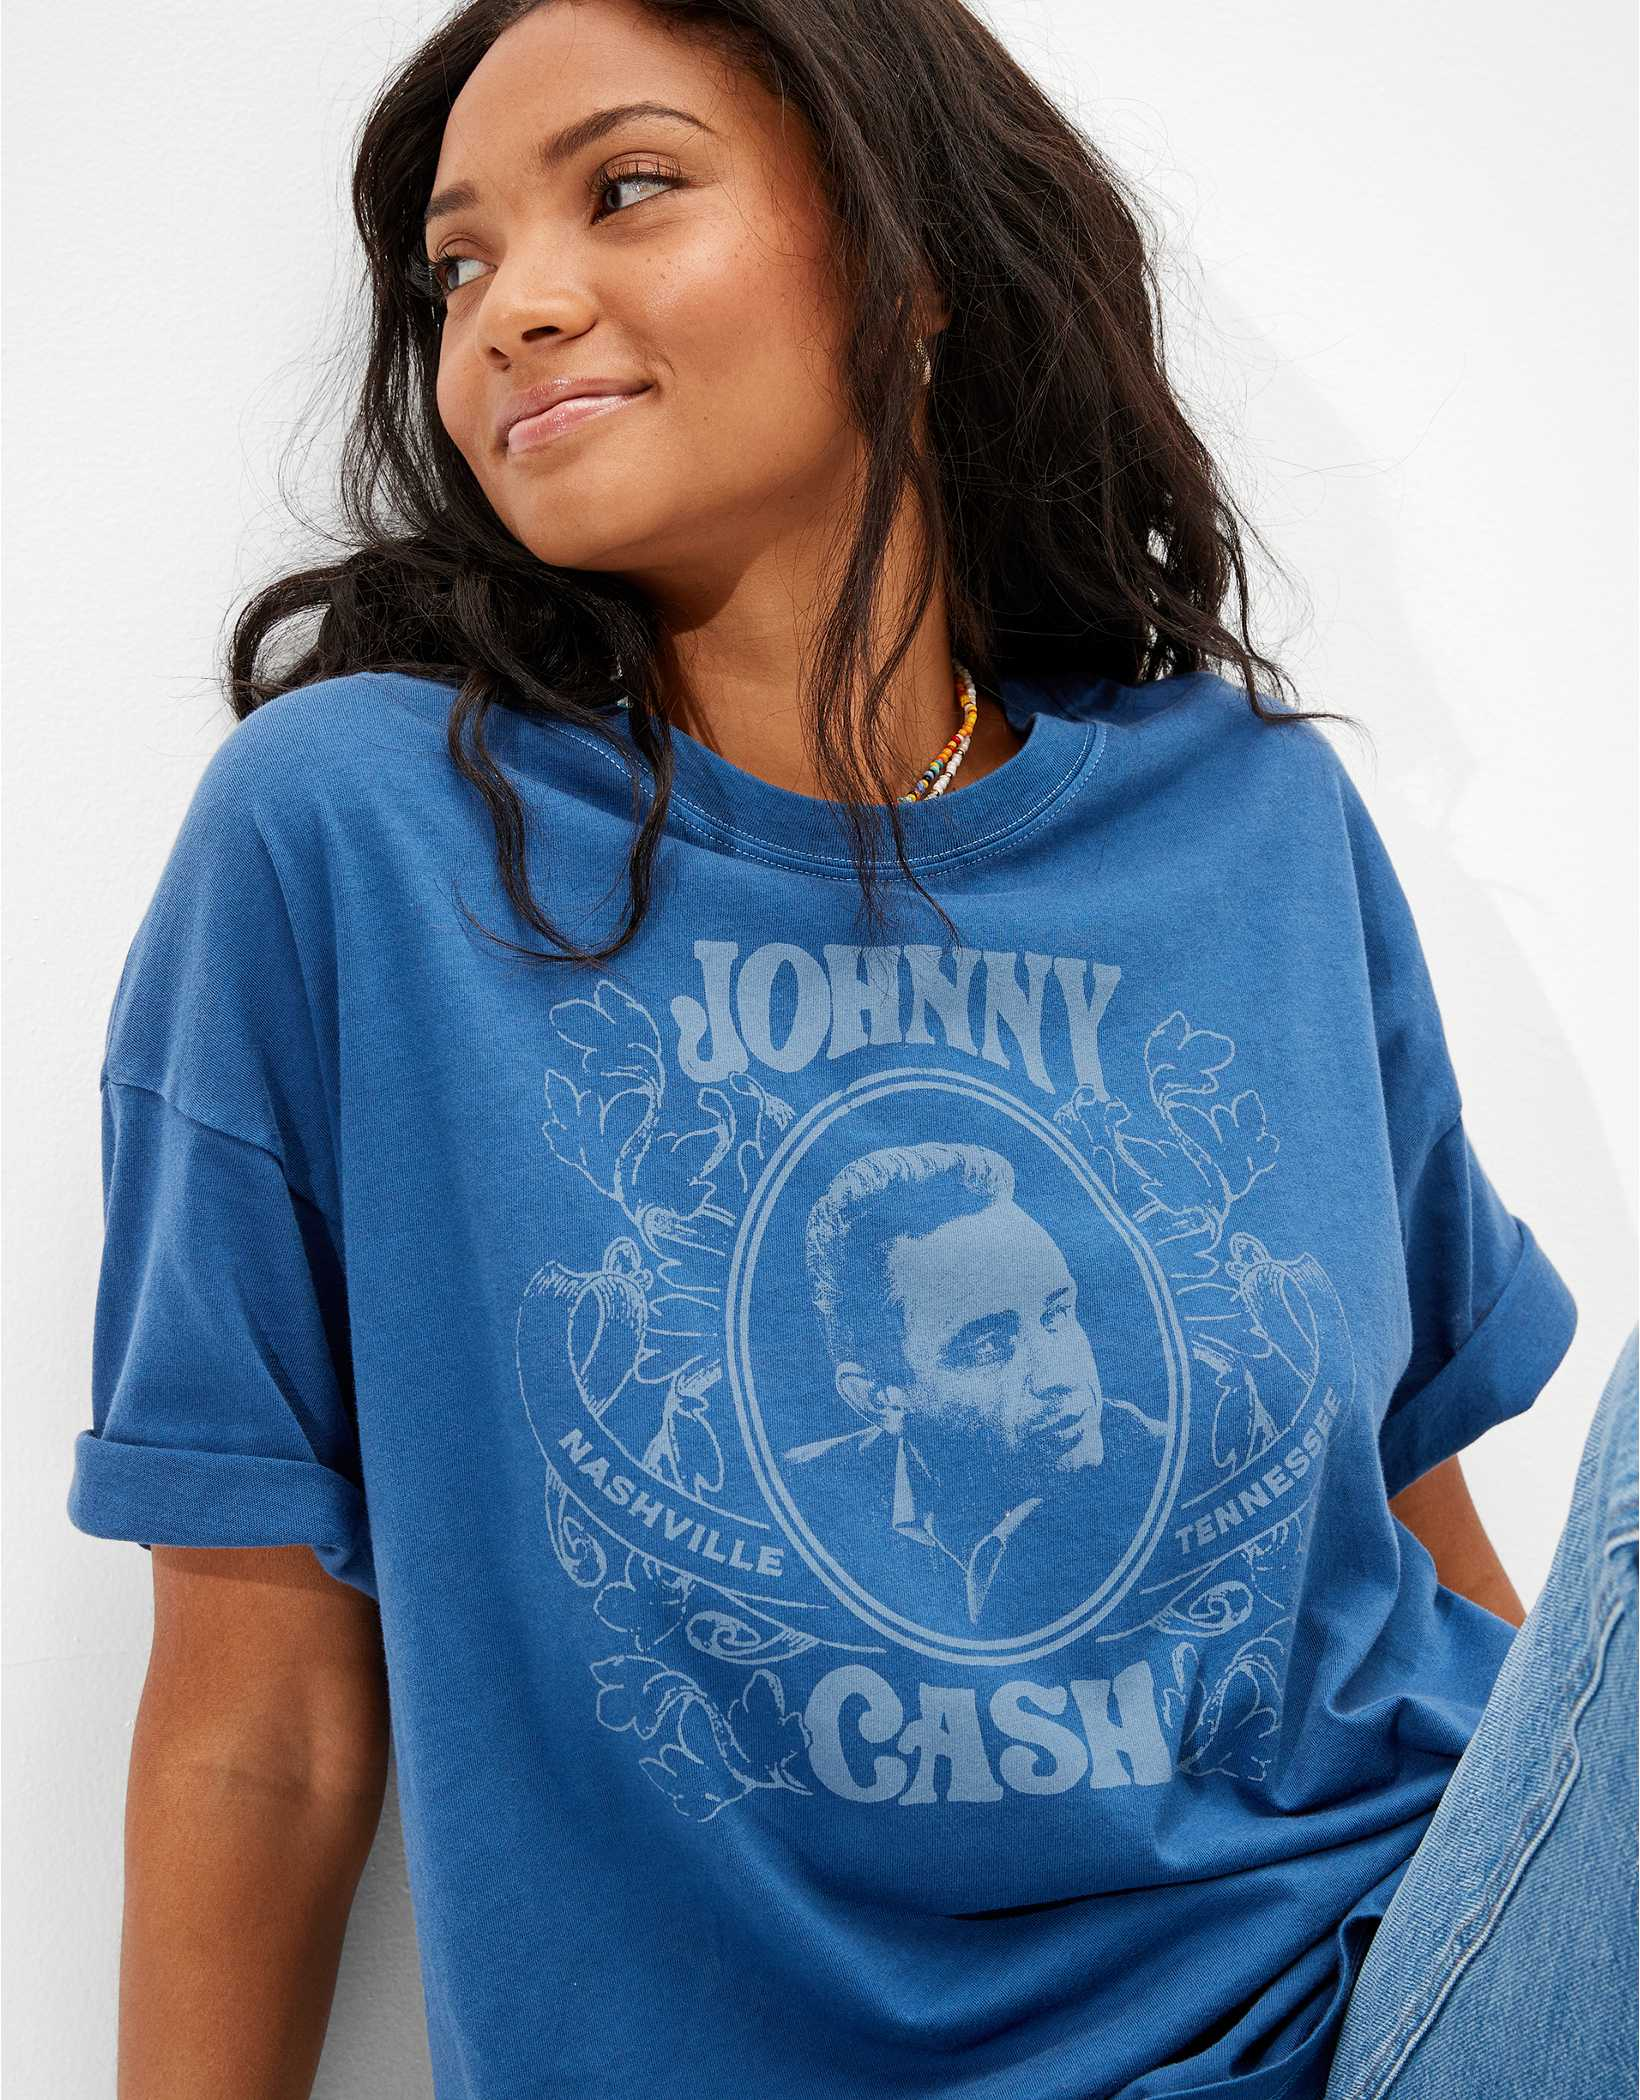 AE Oversized Johnny Cash Graphic T-Shirt